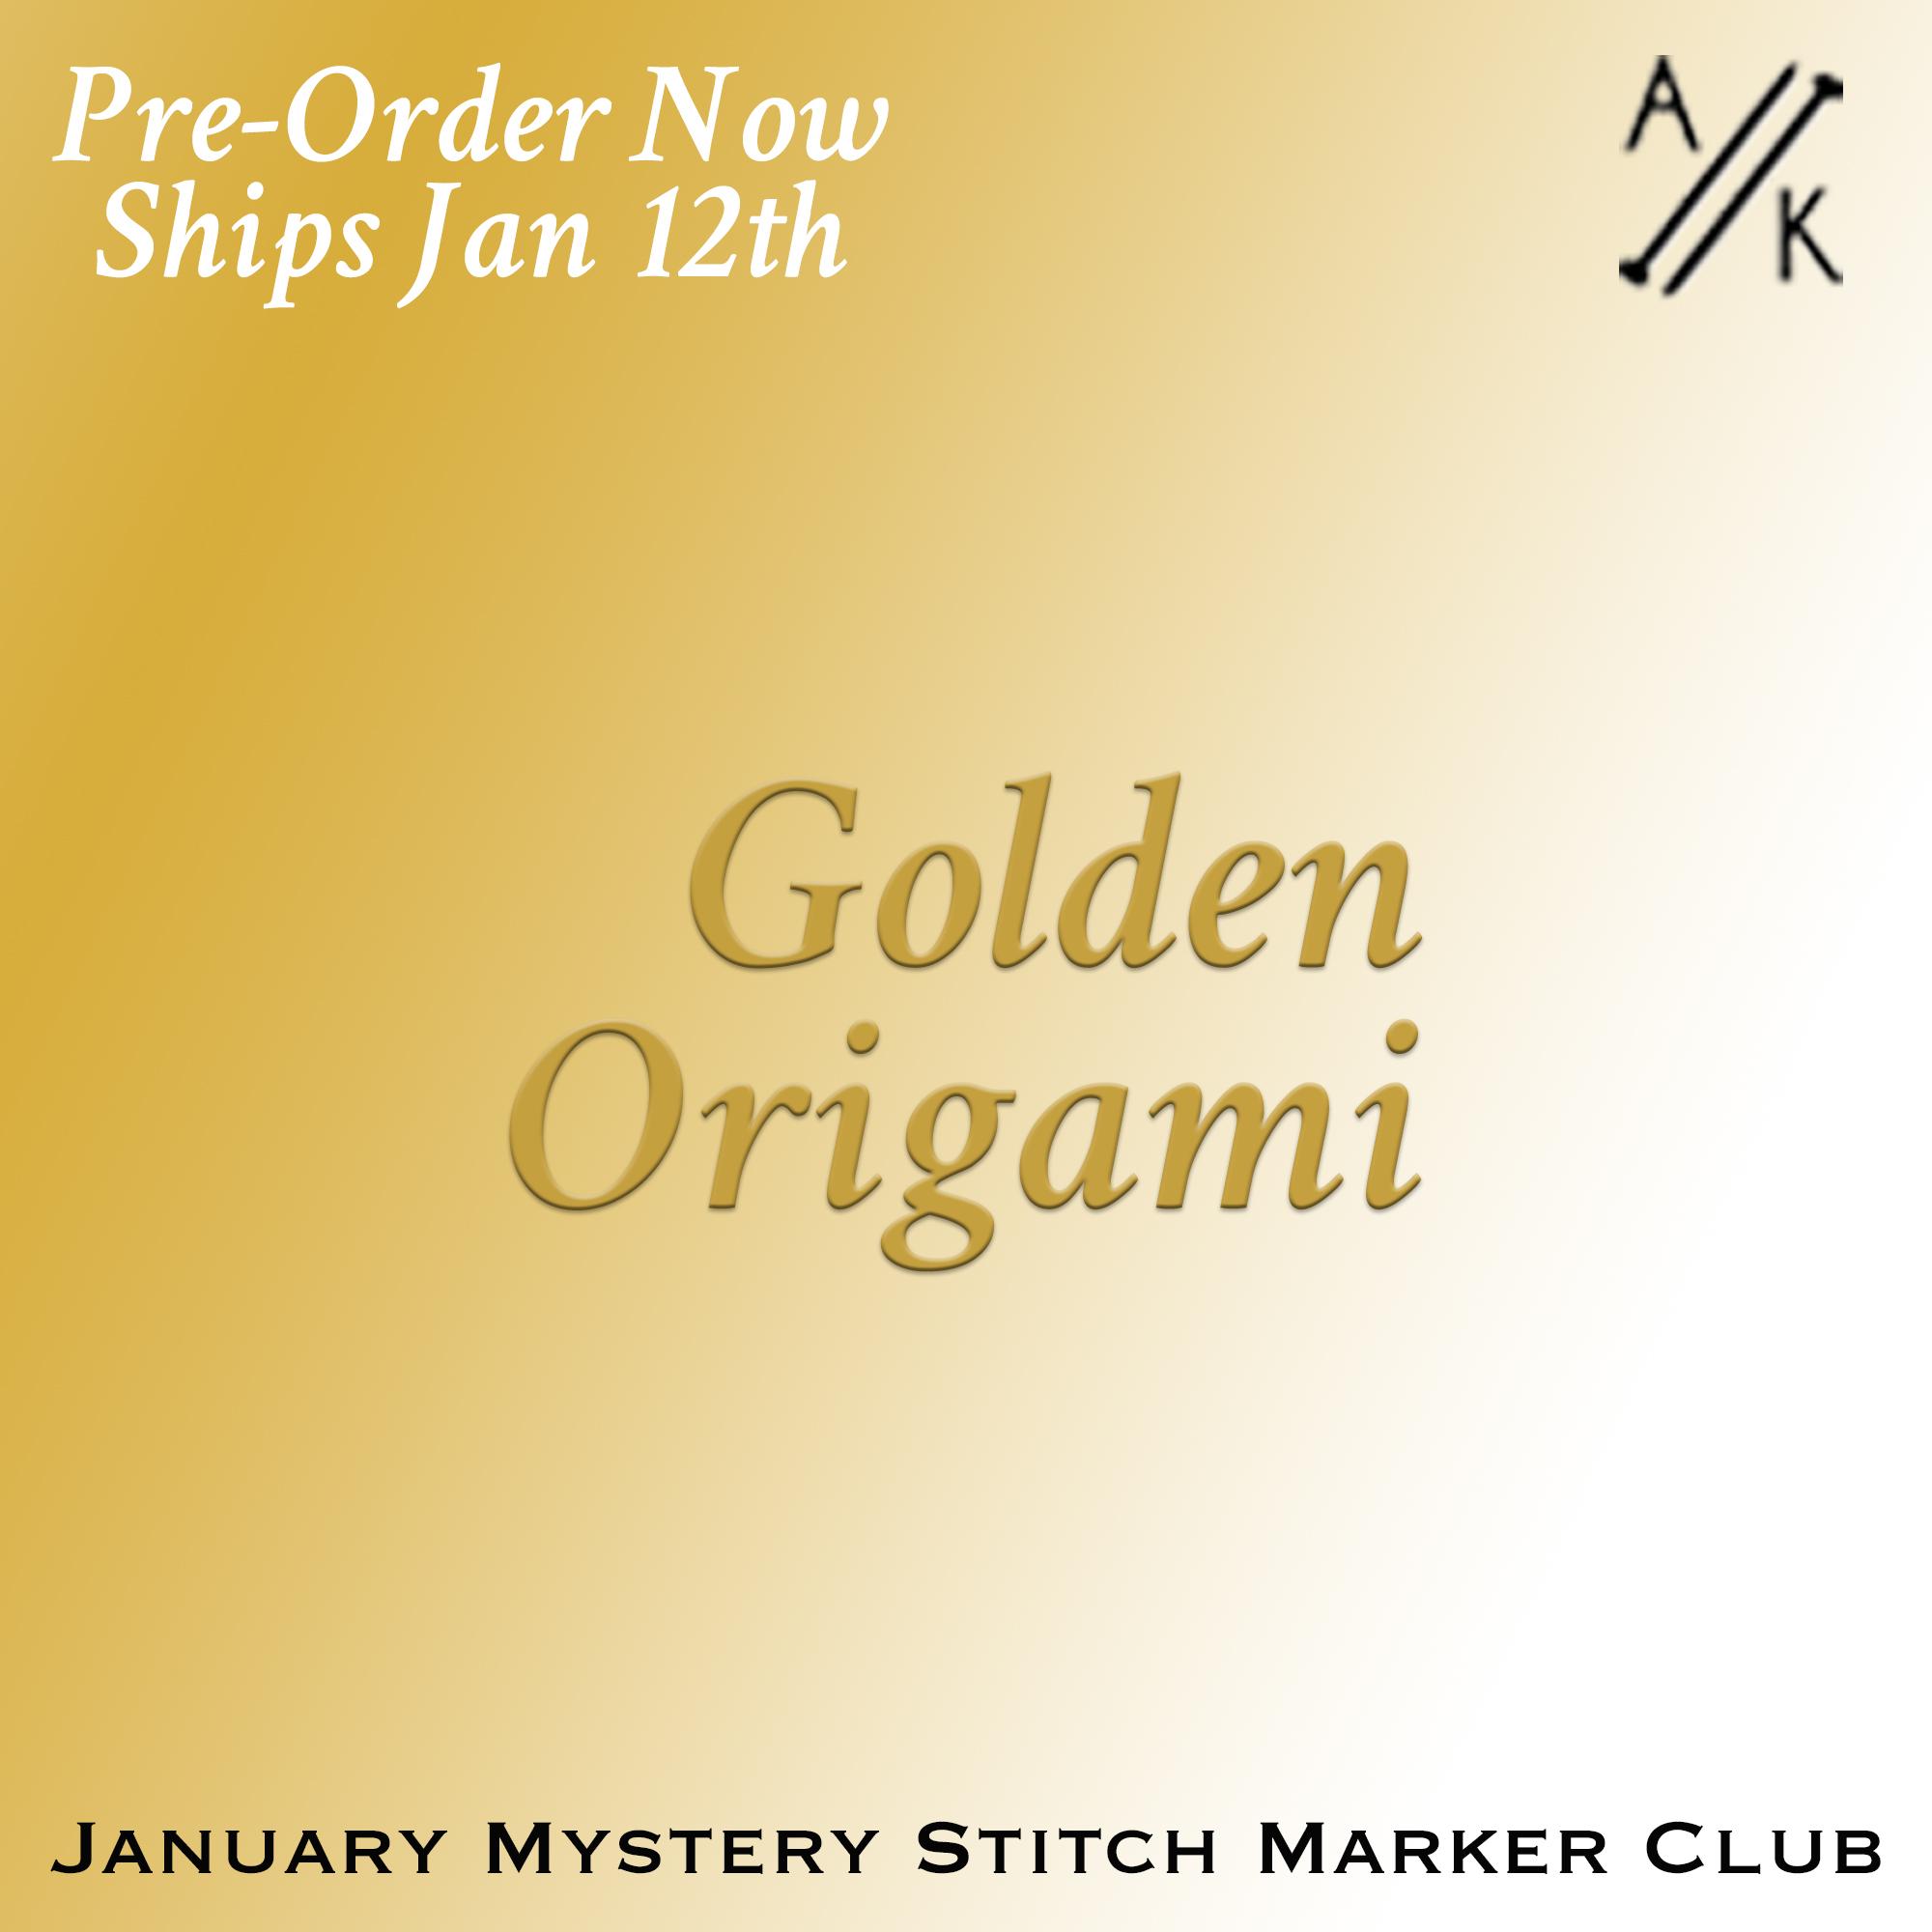 January Mystery Stitch Marker Club